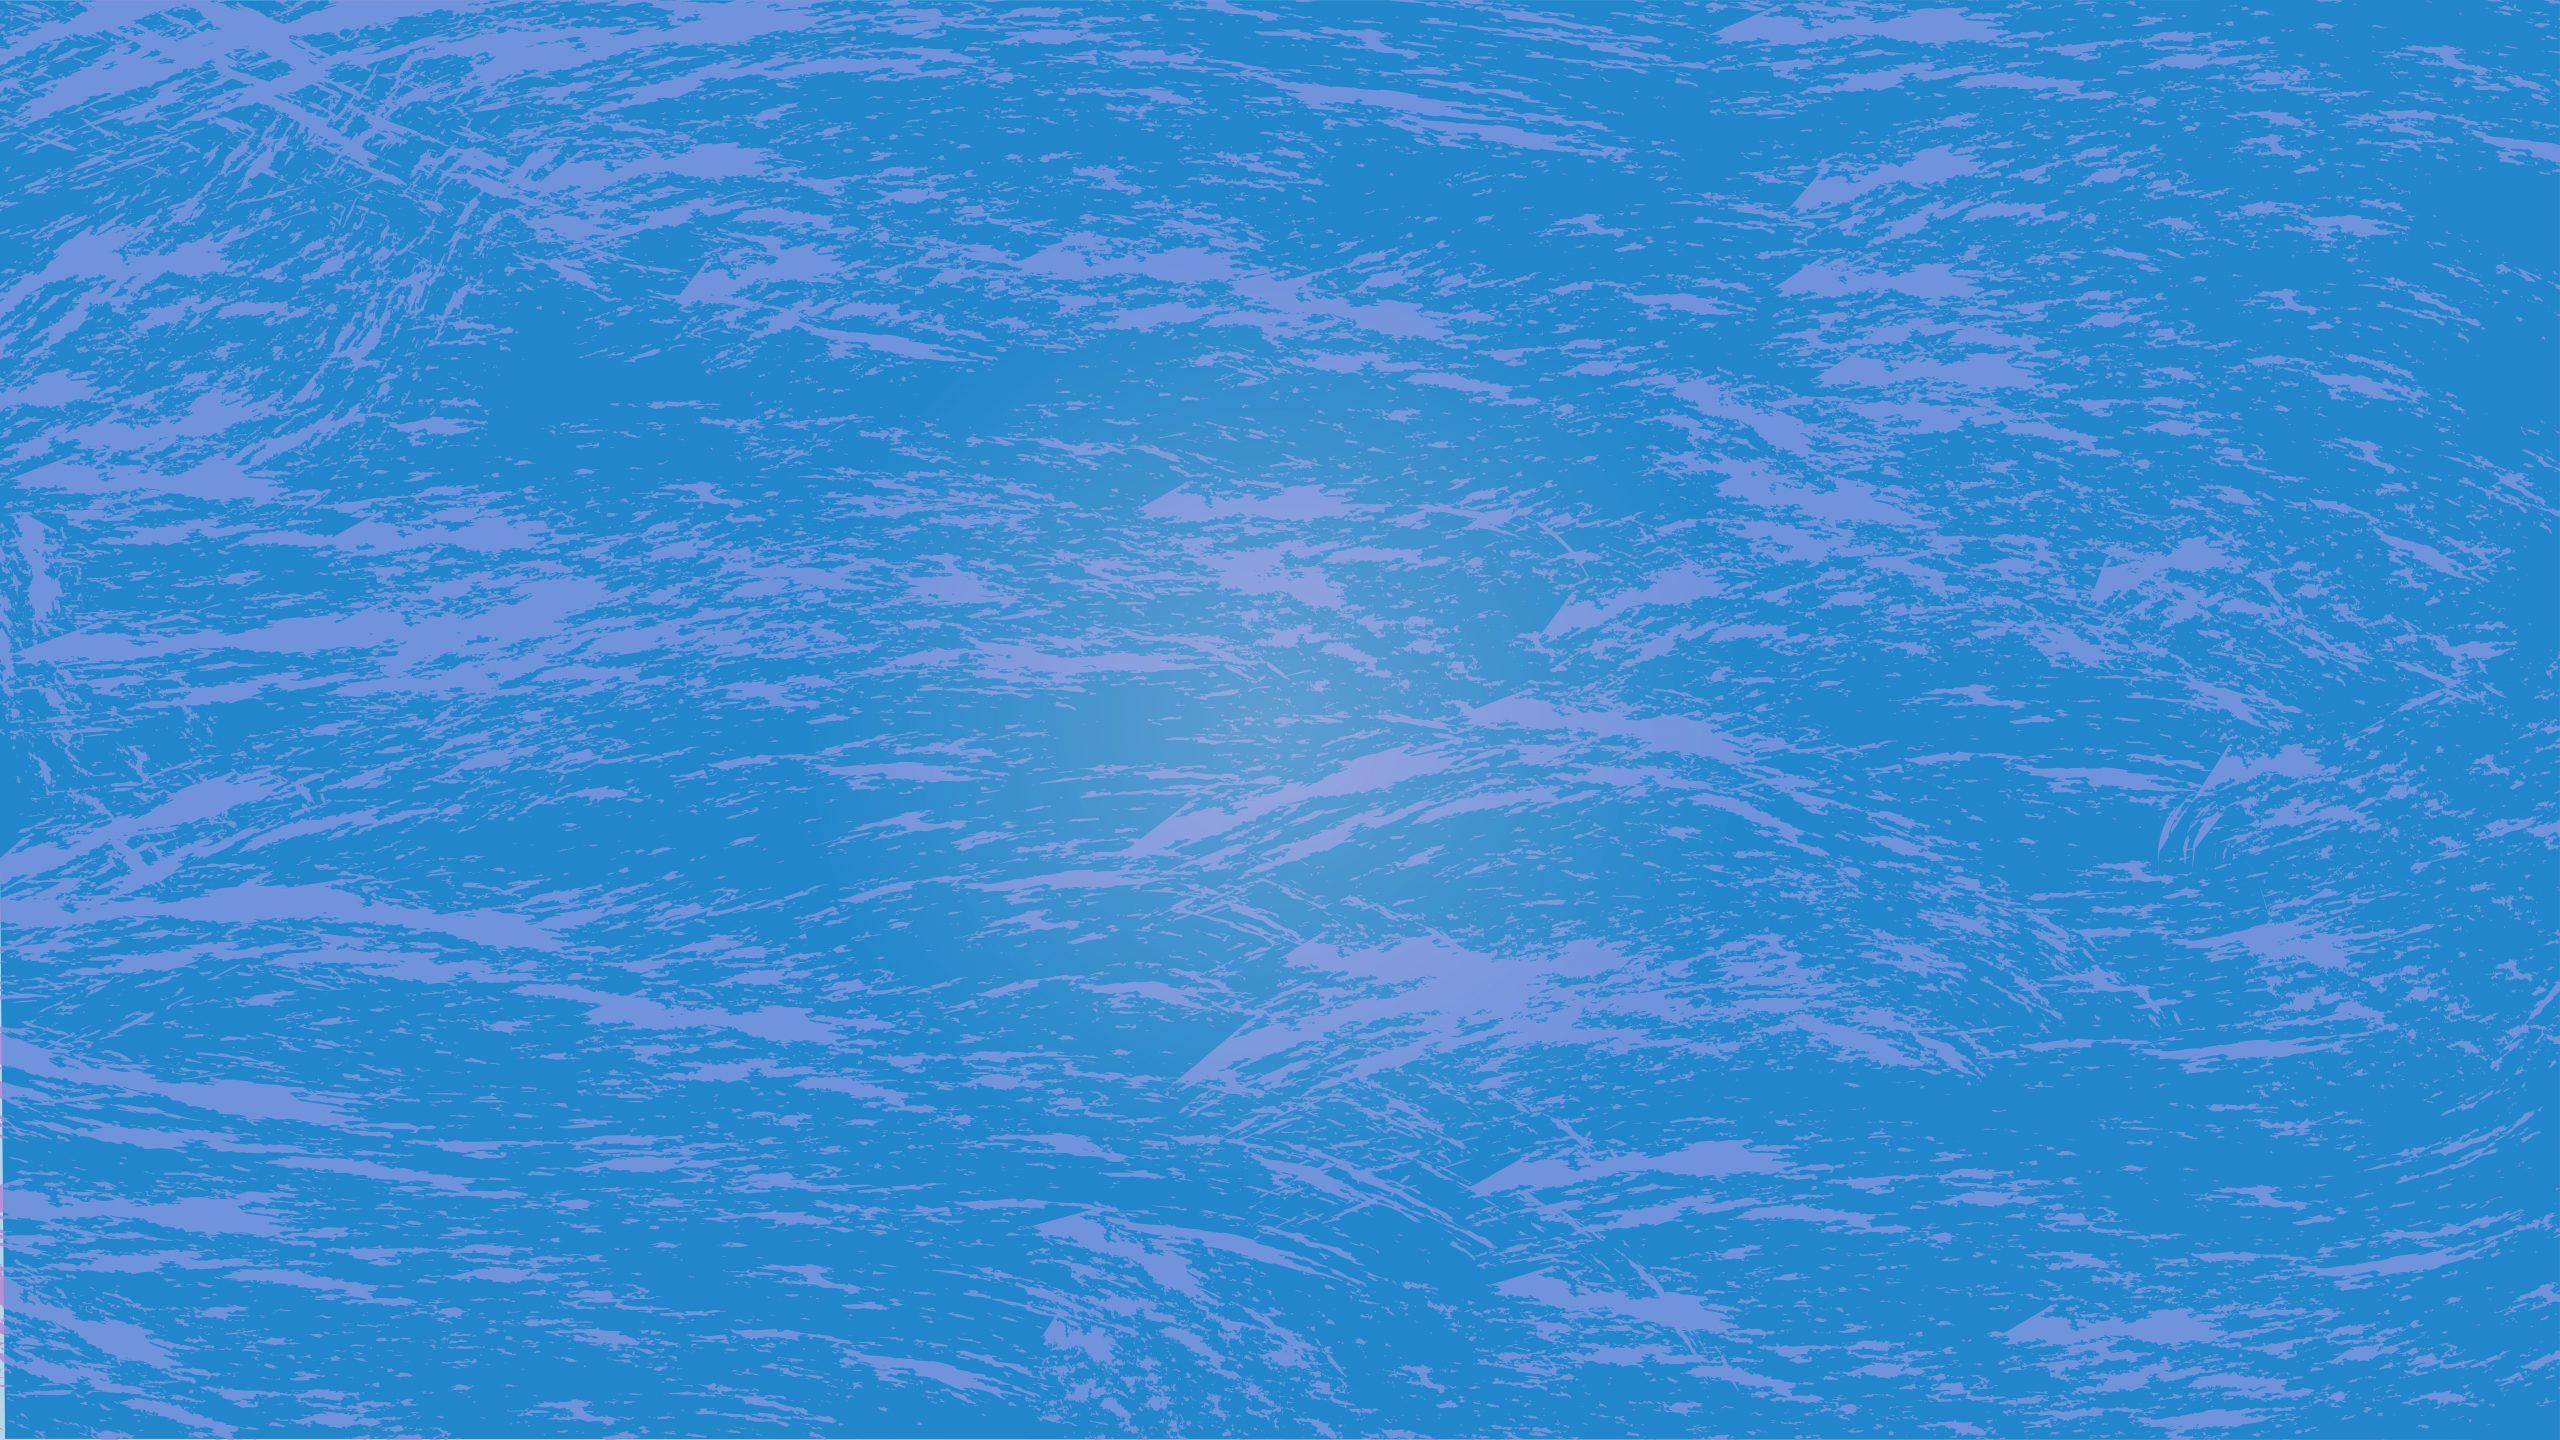 water-texture-background